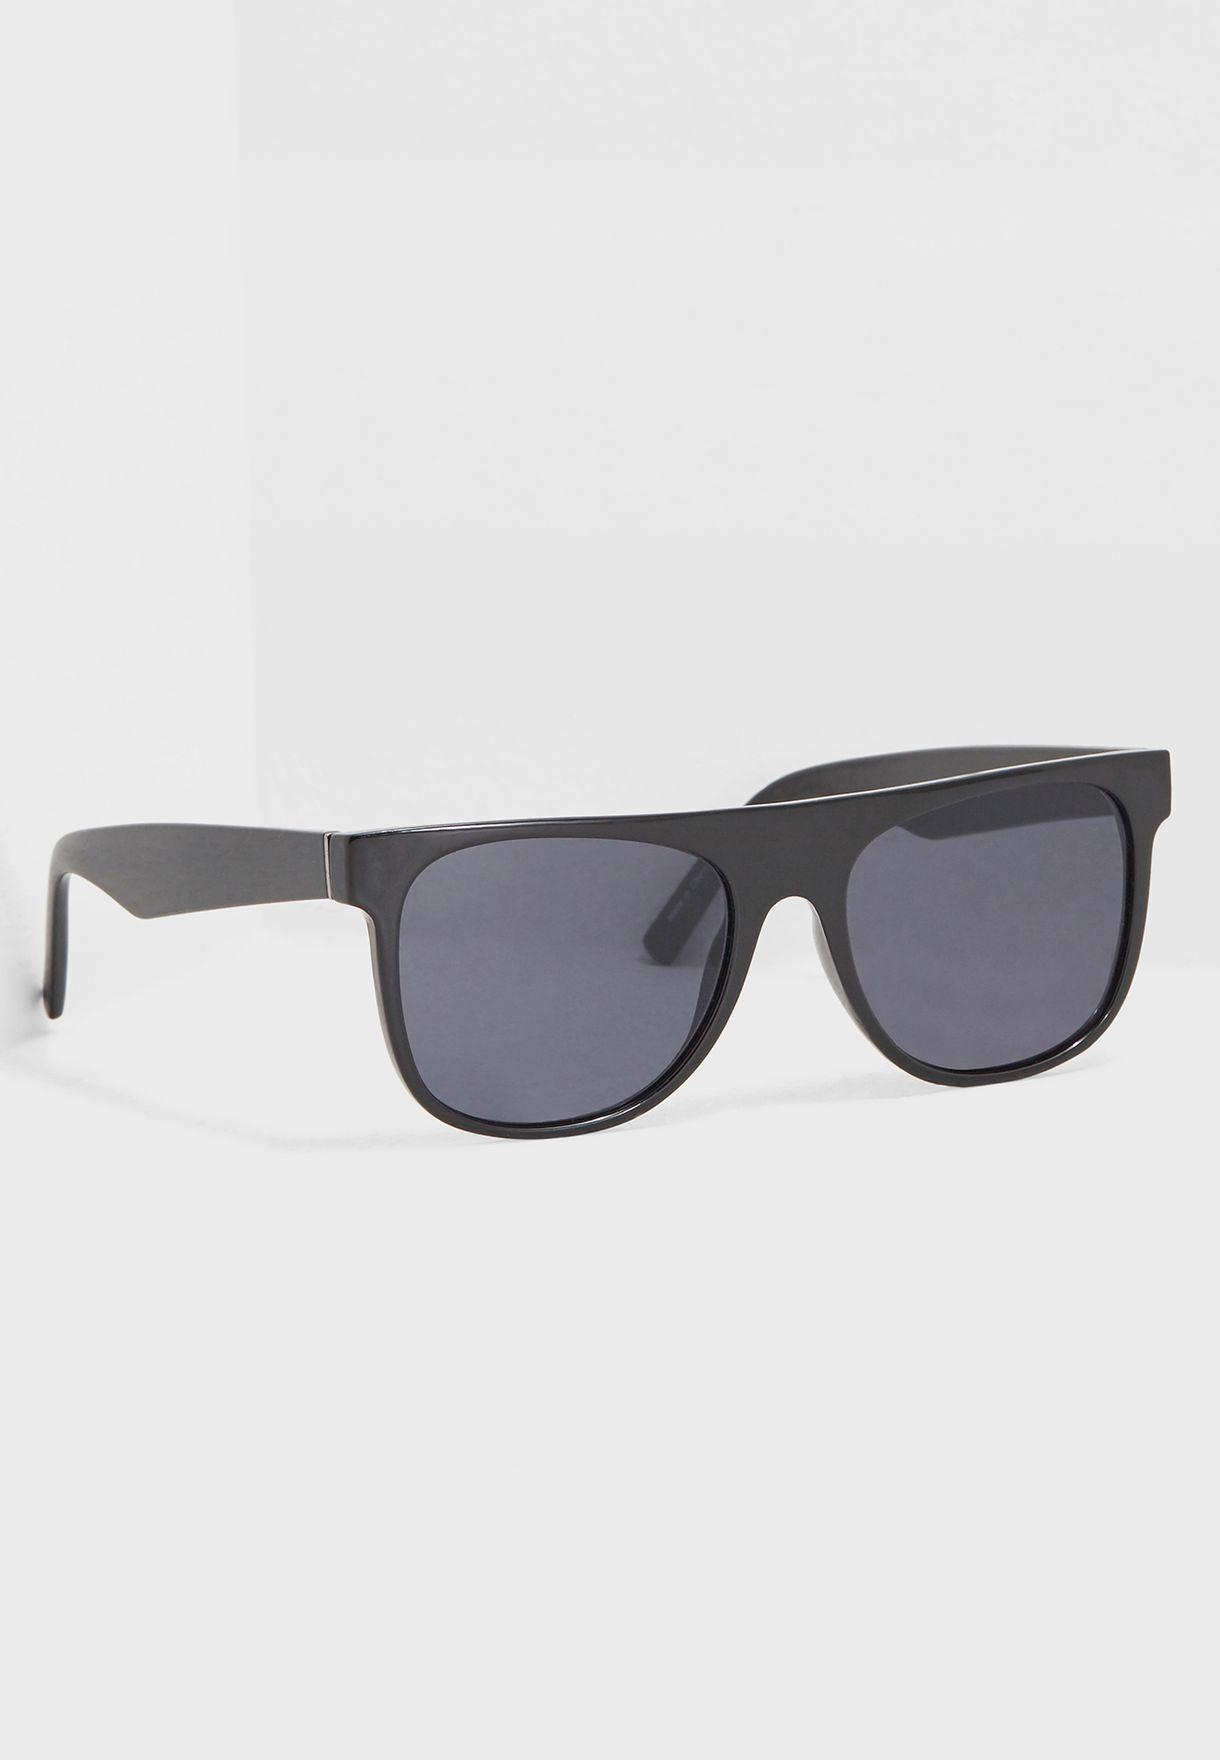 9c0de6bda2 Shop Aldo black Graemwen Sunglasses GRAEMWEN97 for Men in UAE ...